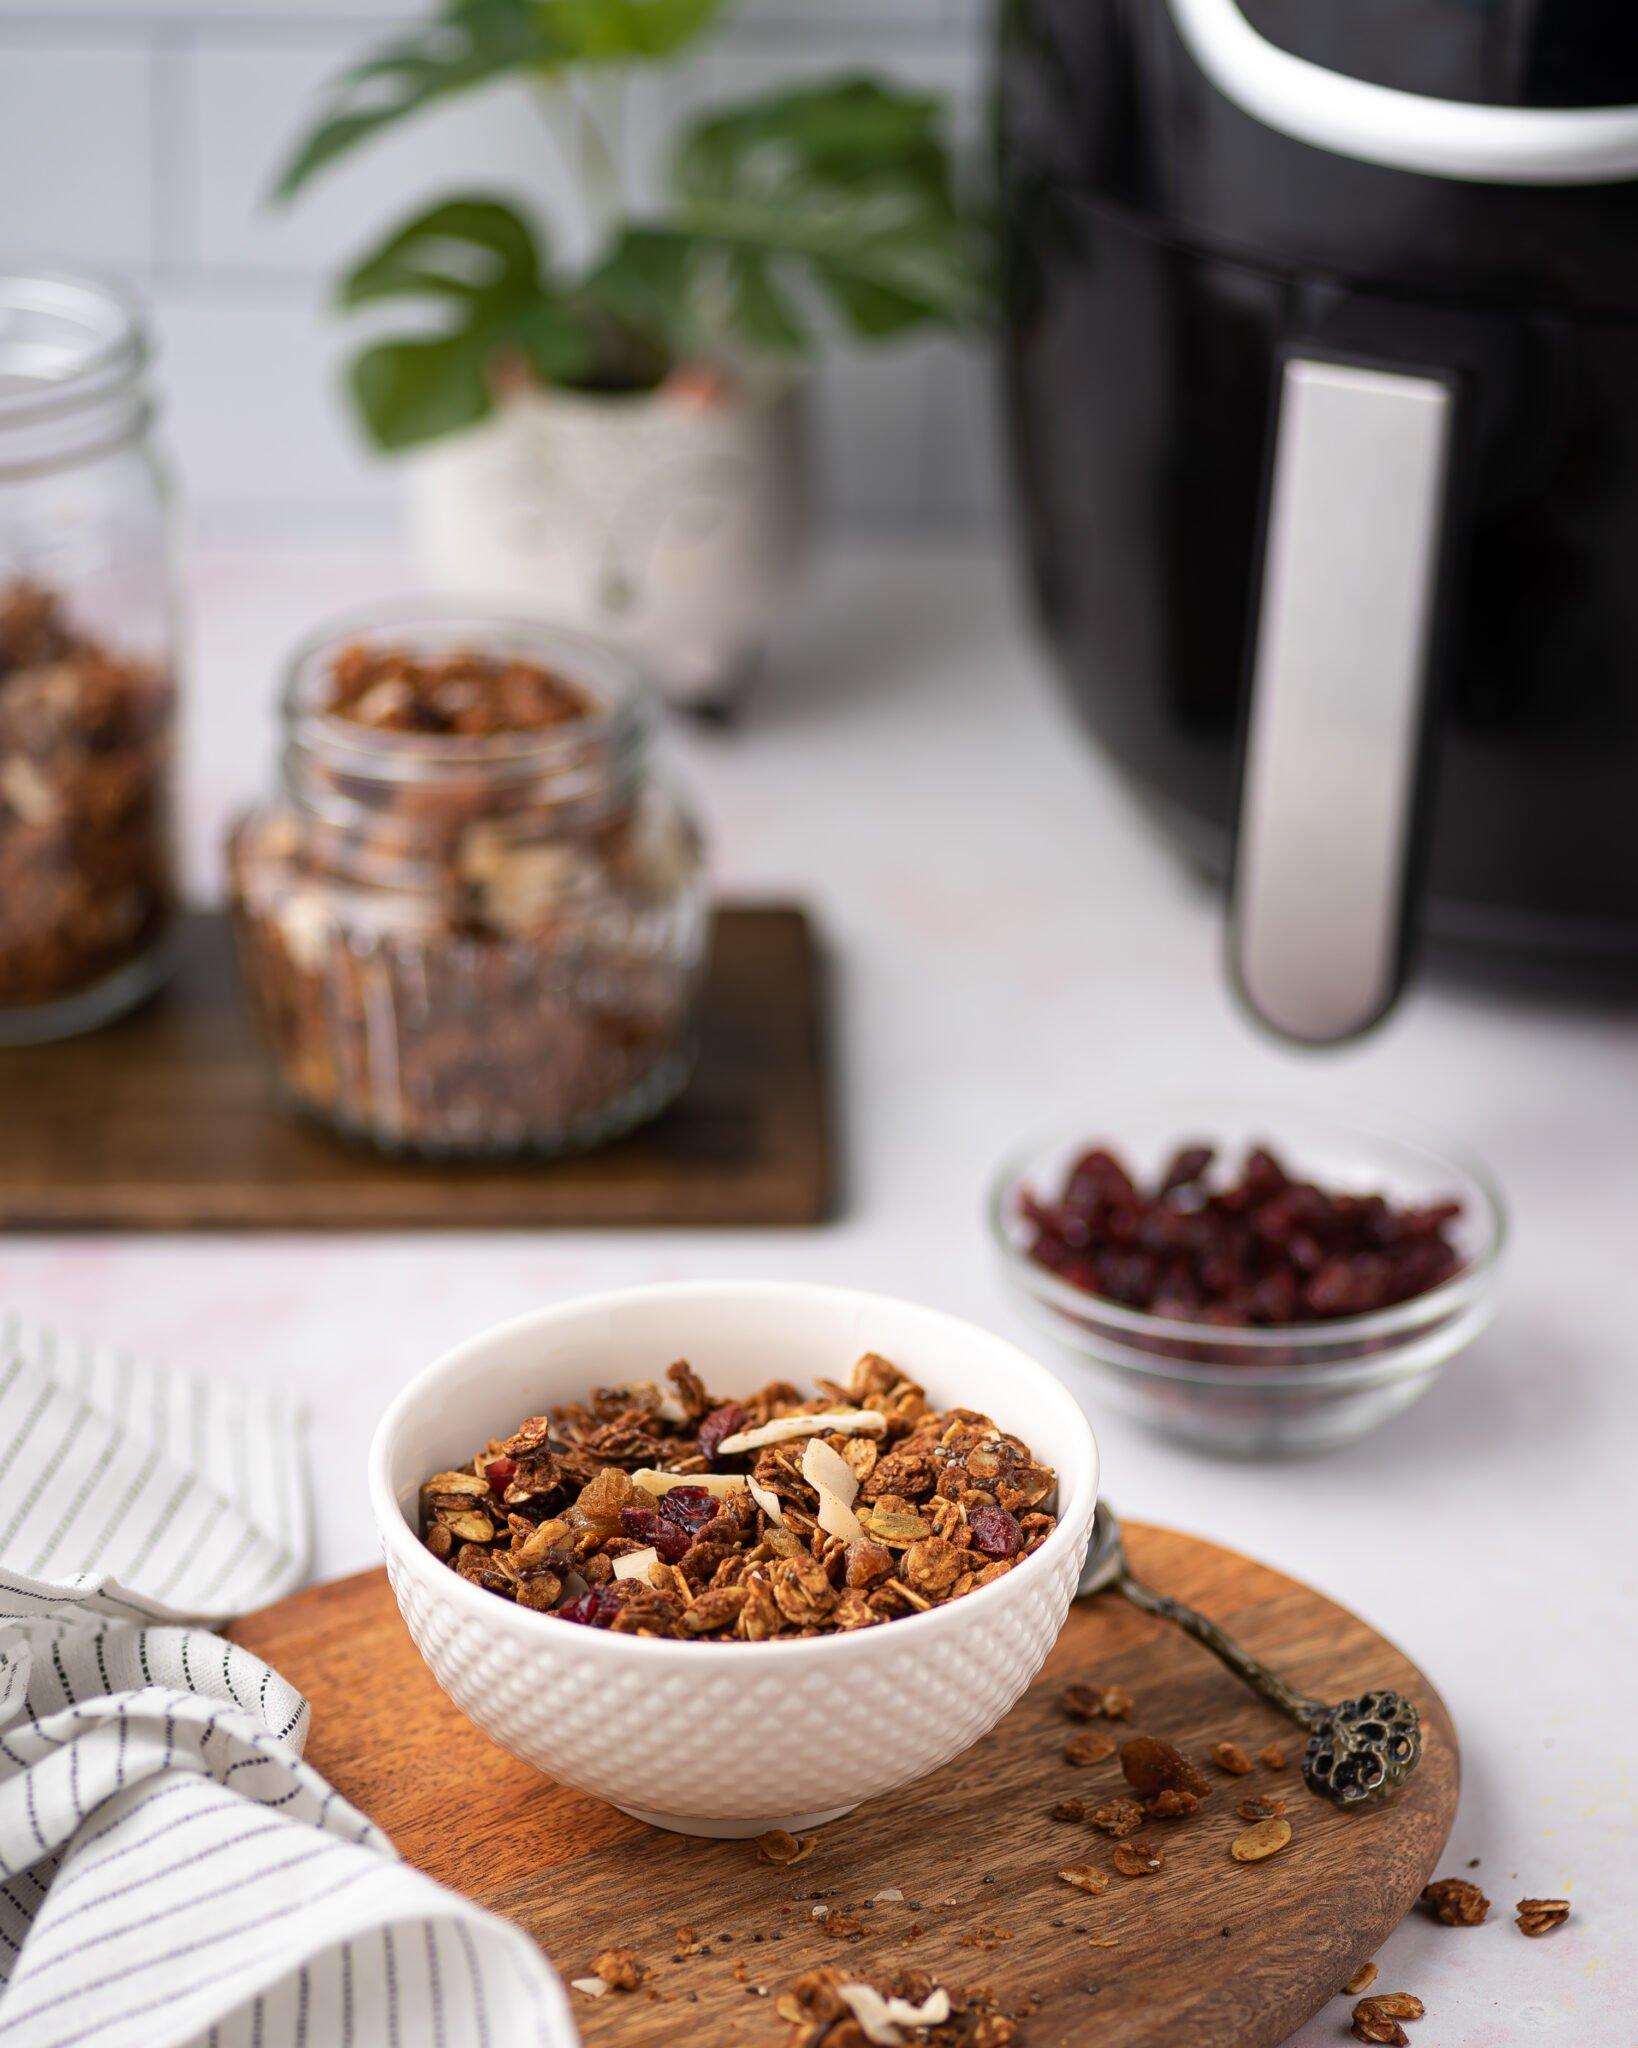 A bowl of homemade Air-Fryer granola